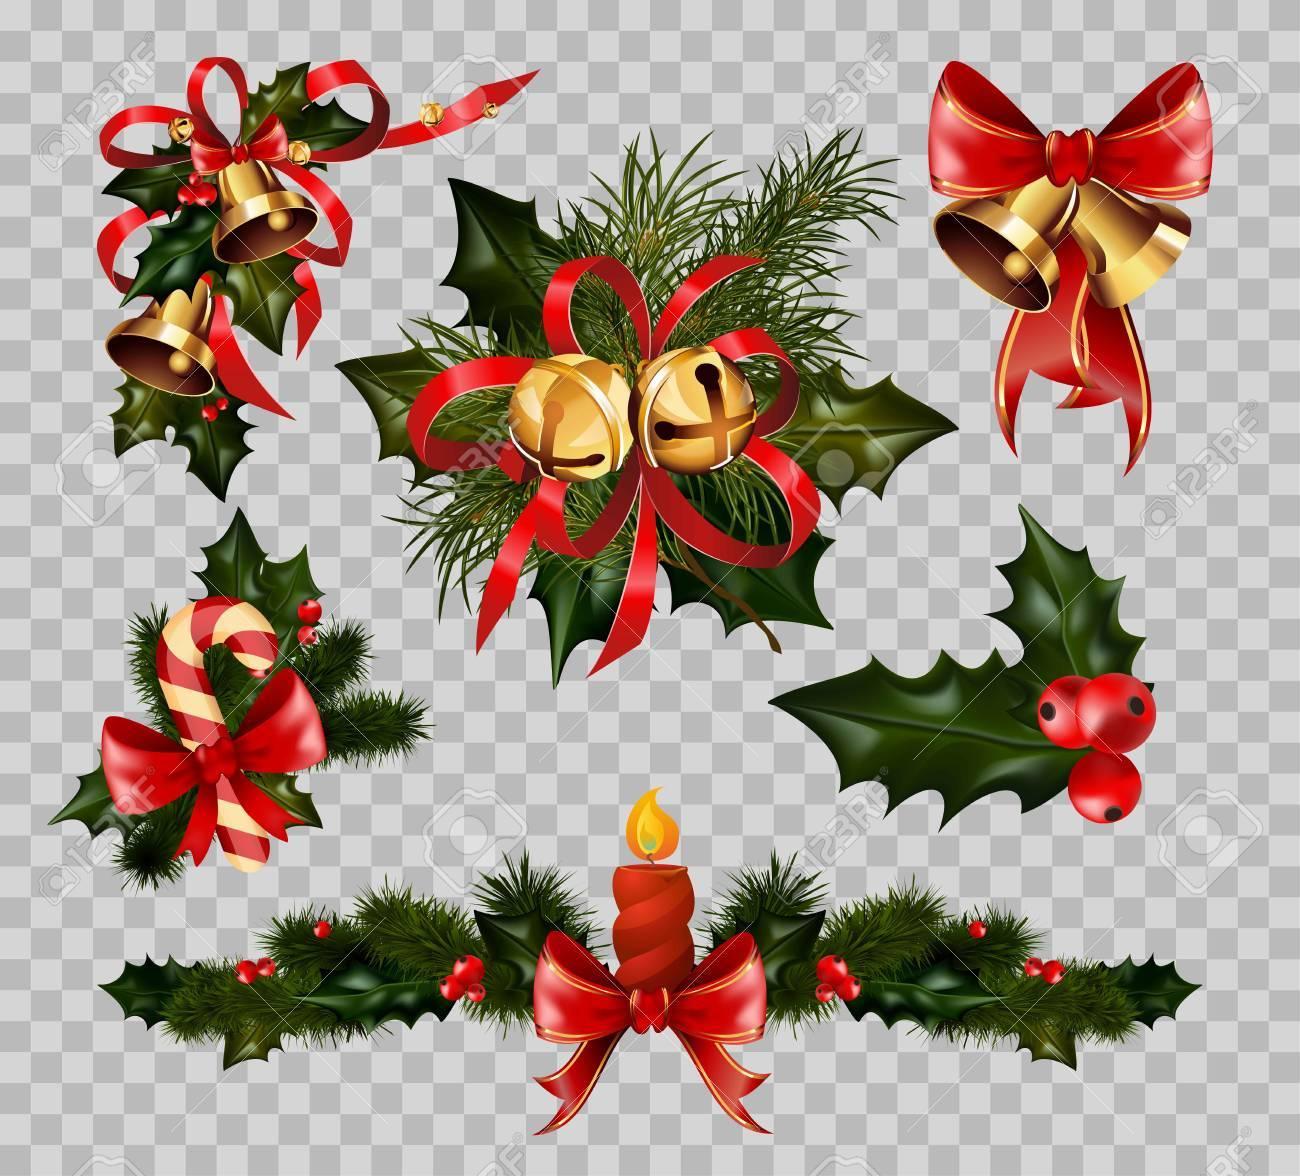 Christmas Decoration Fir Wreath Bow Elements Vector Isolated